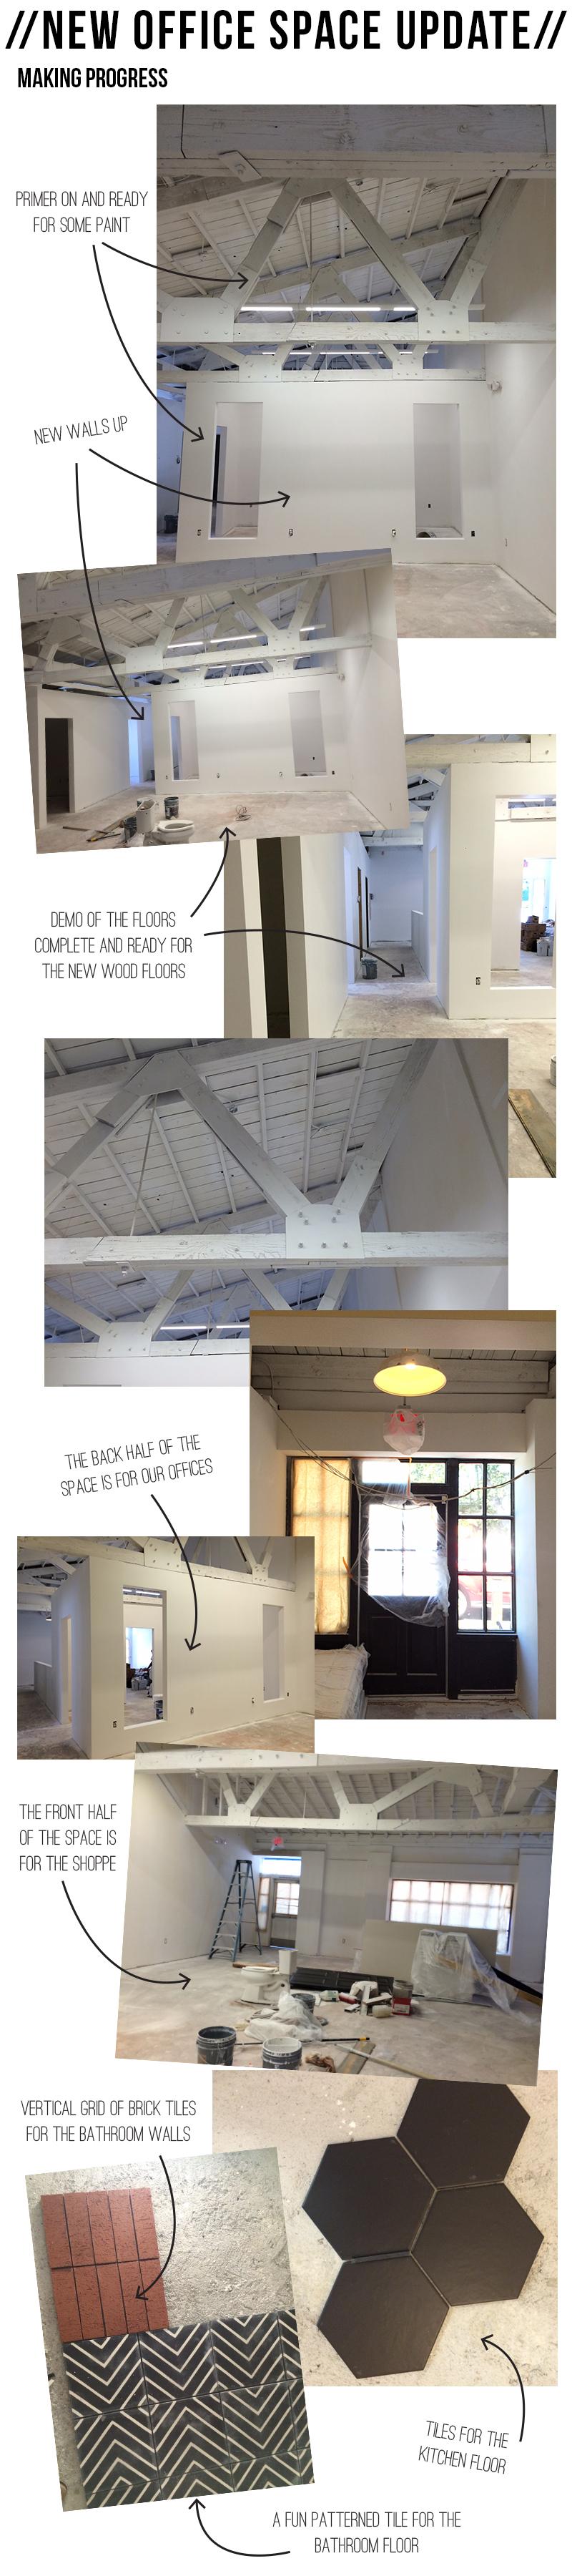 Amber Interiors - New Office Update - 07.16